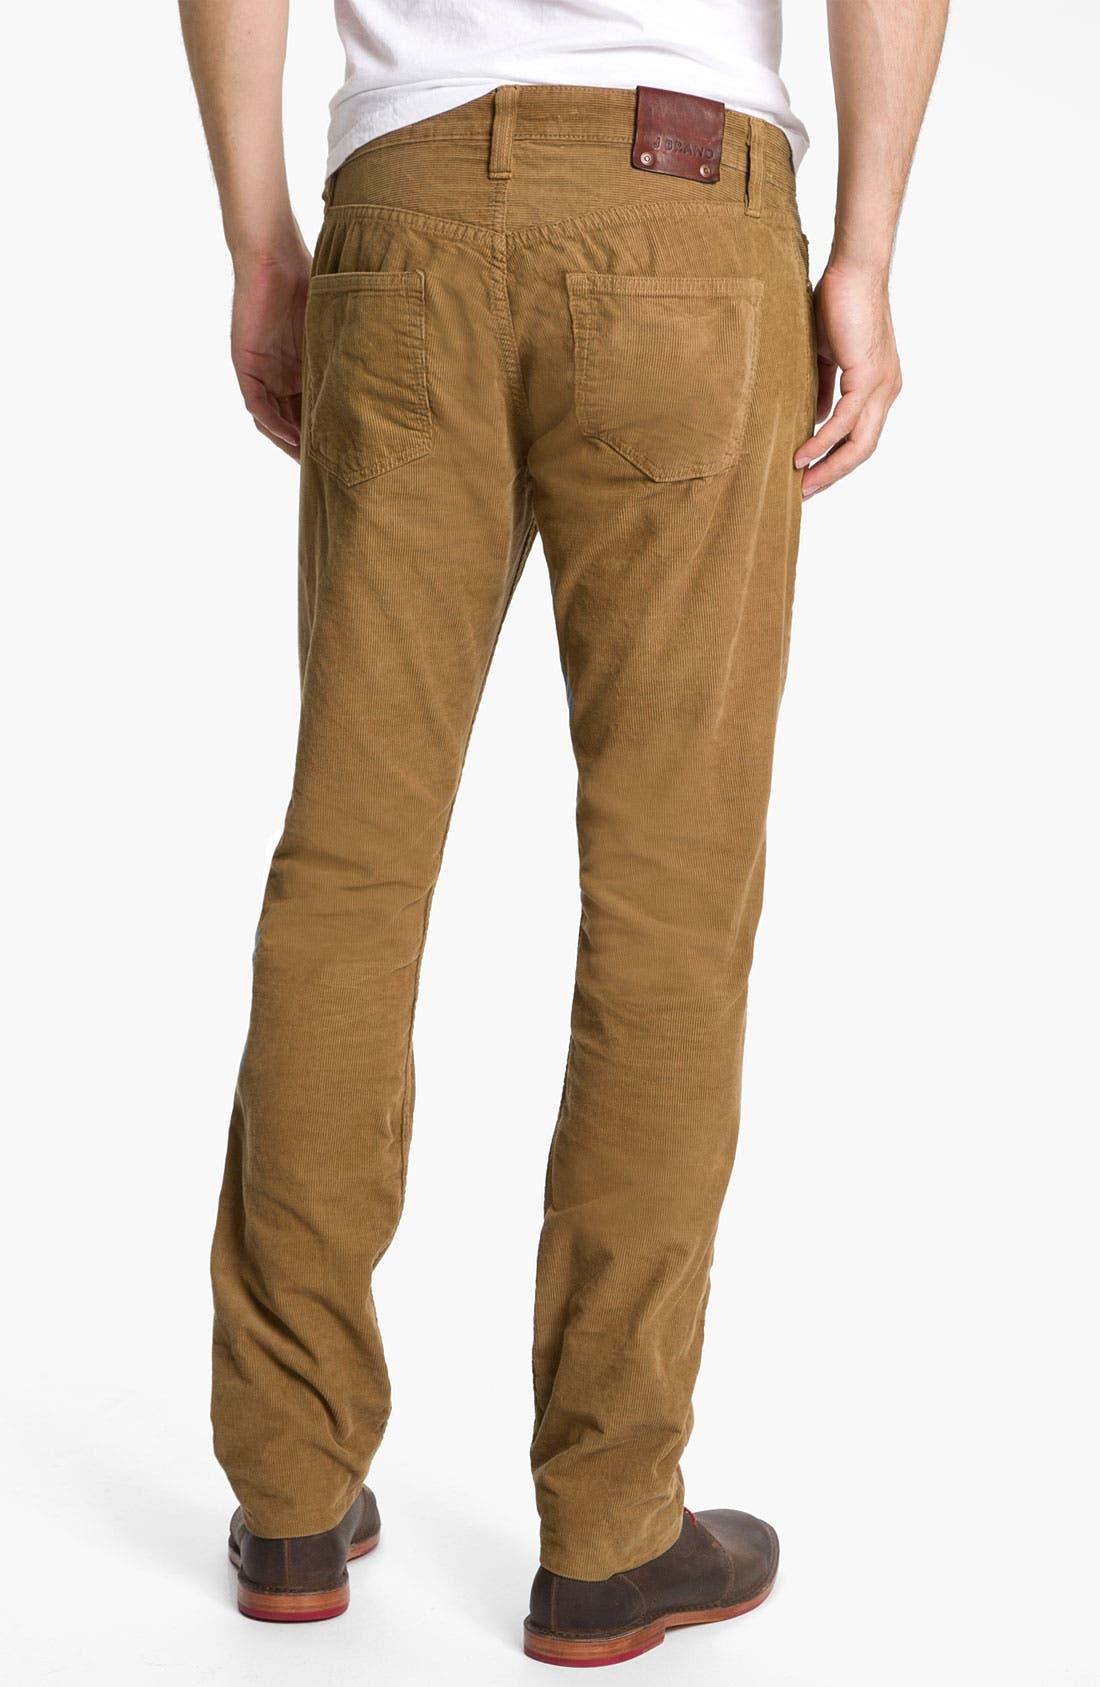 Alternate Image 1 Selected - J Brand 'Kane' Slim Straight Leg Corduroy Pants